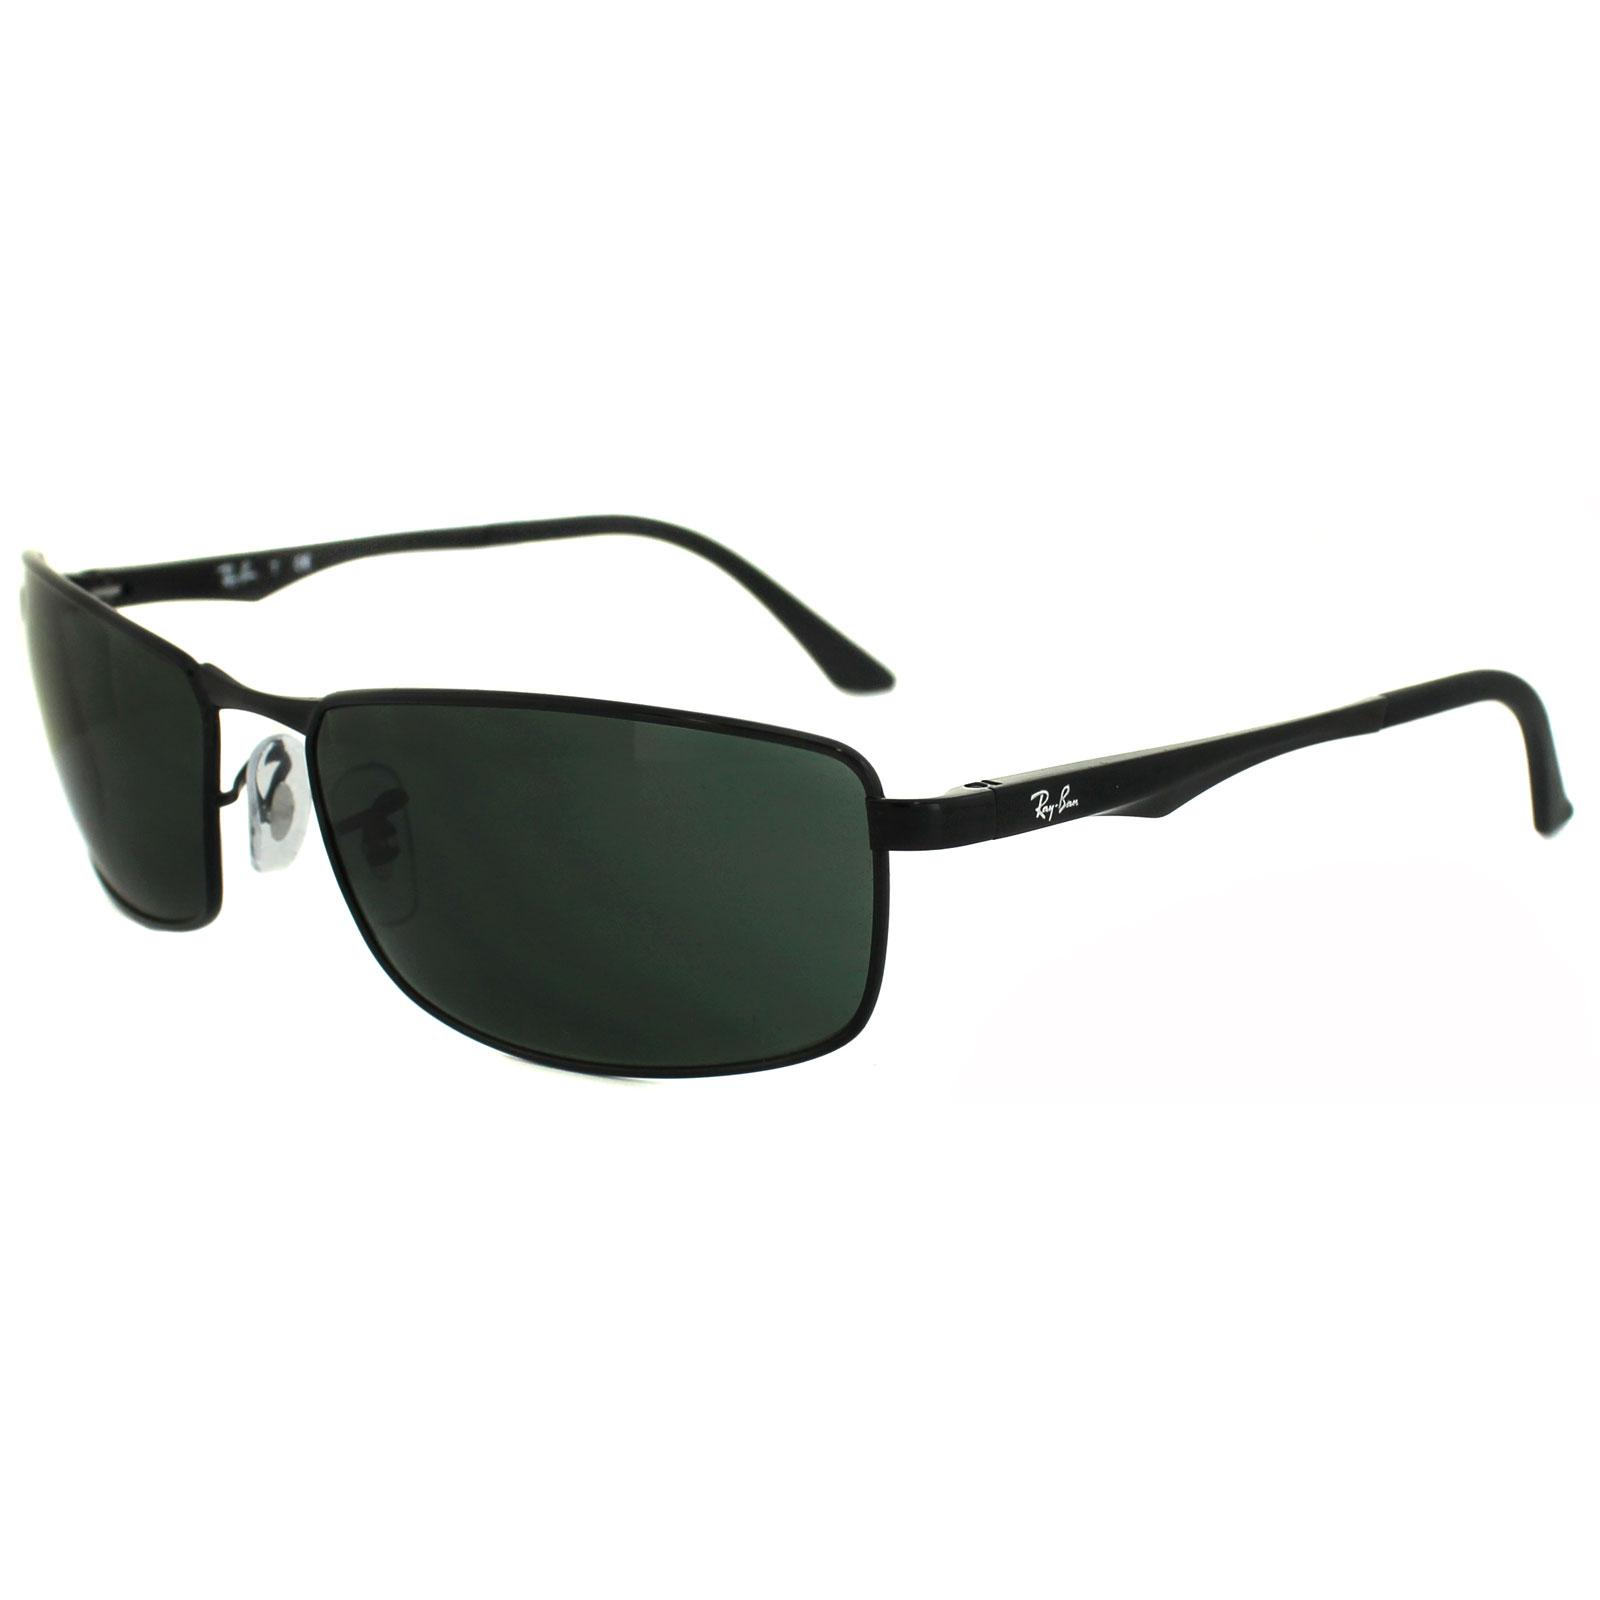 Cheap Ray Ban 3498 Sunglasses Discounted Sunglasses